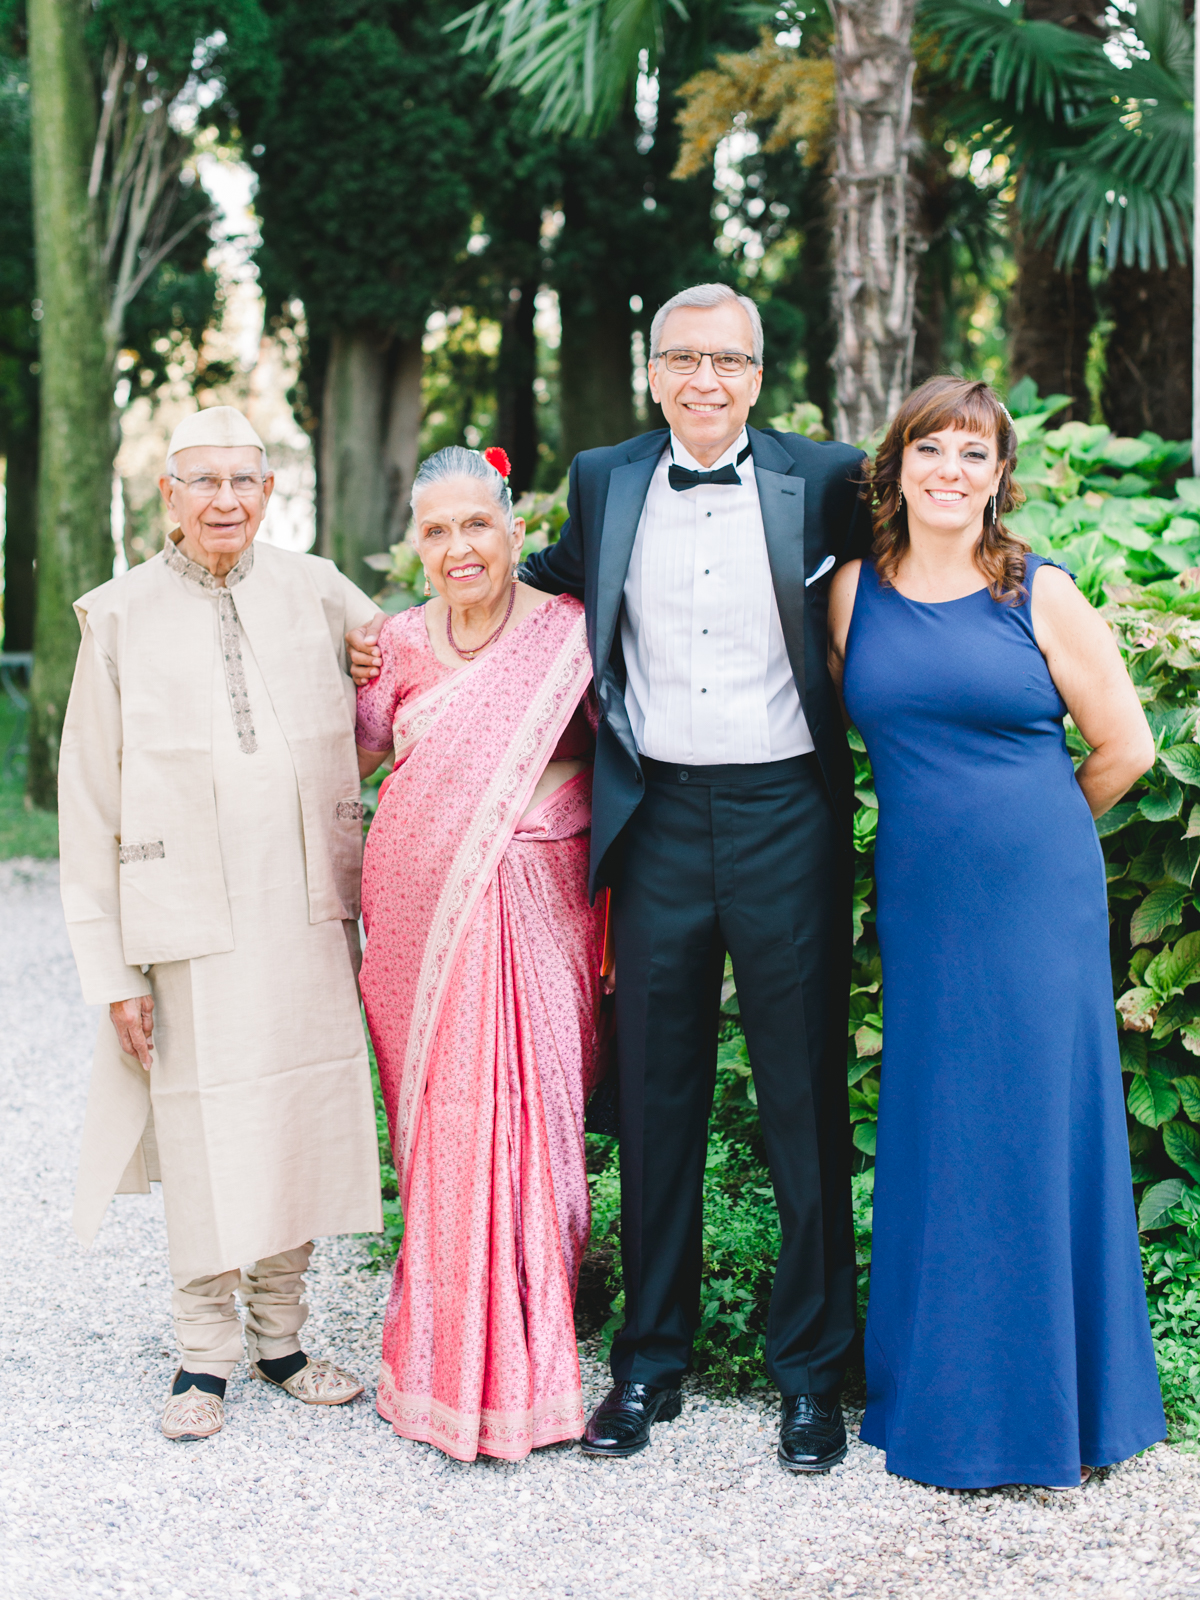 Palace_Villa_Cortine_Hotel_Italian_Wedding_Photographer_Sirmione_AKP-25.jpg